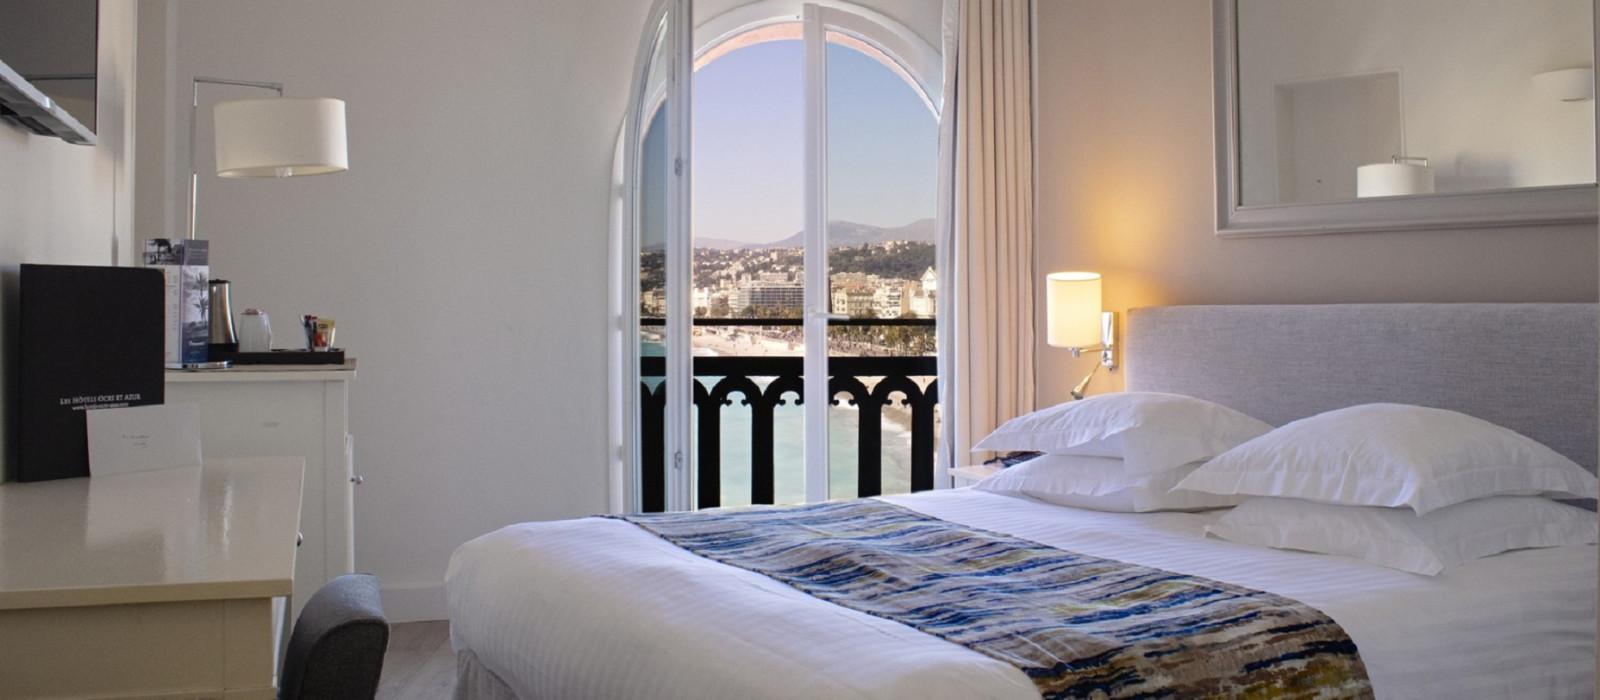 Hotel Le Suisse France